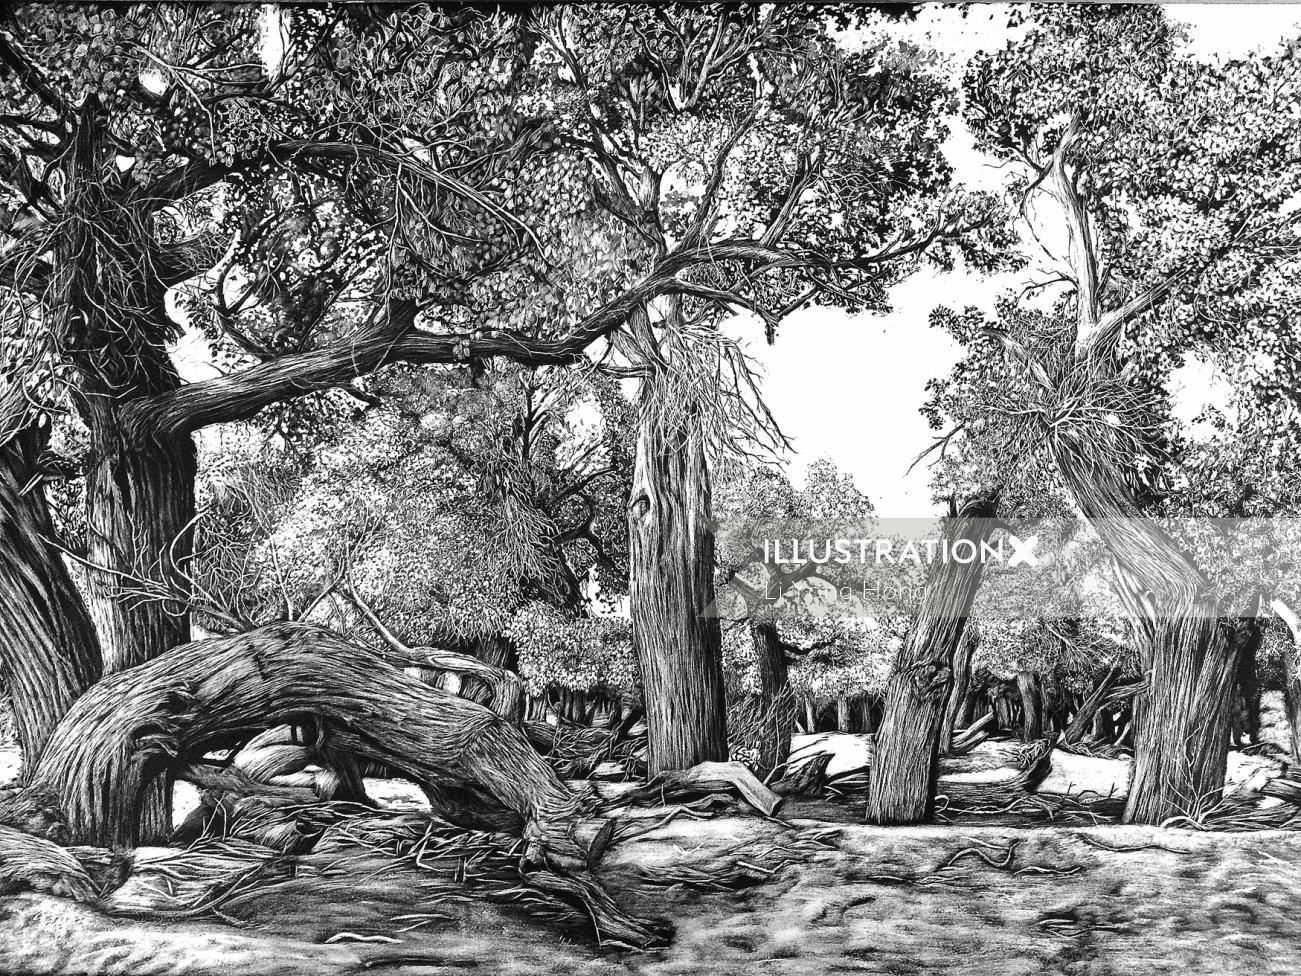 Nature illustration of forest